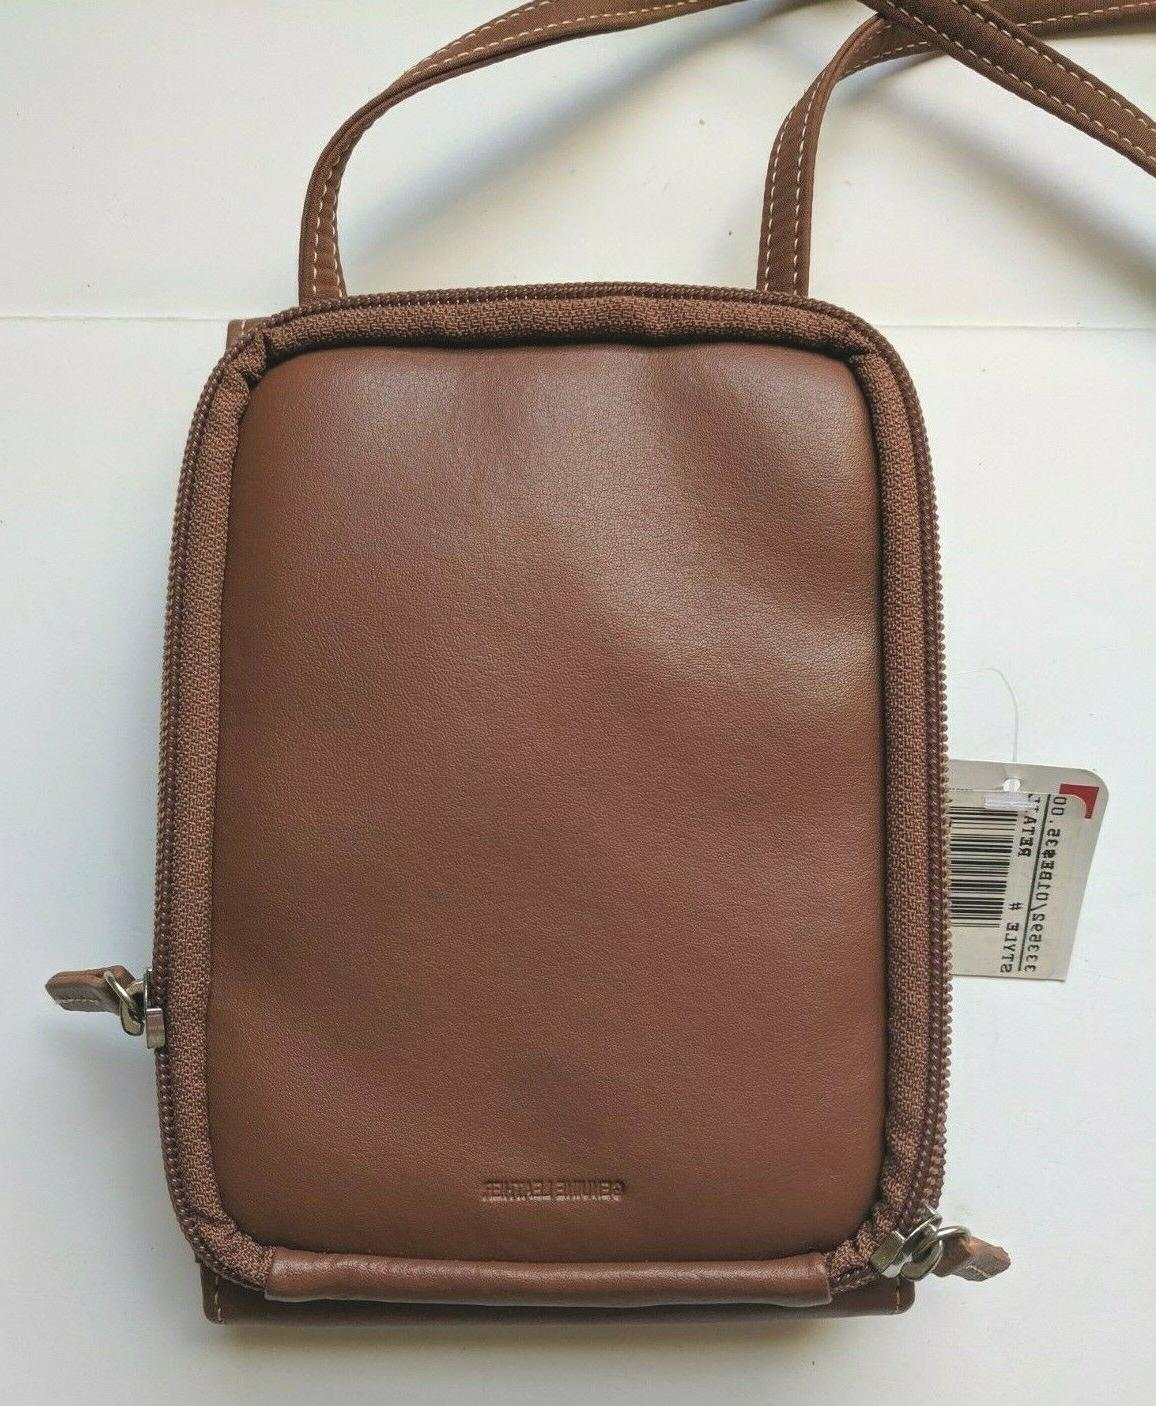 New! Up Mini Bag